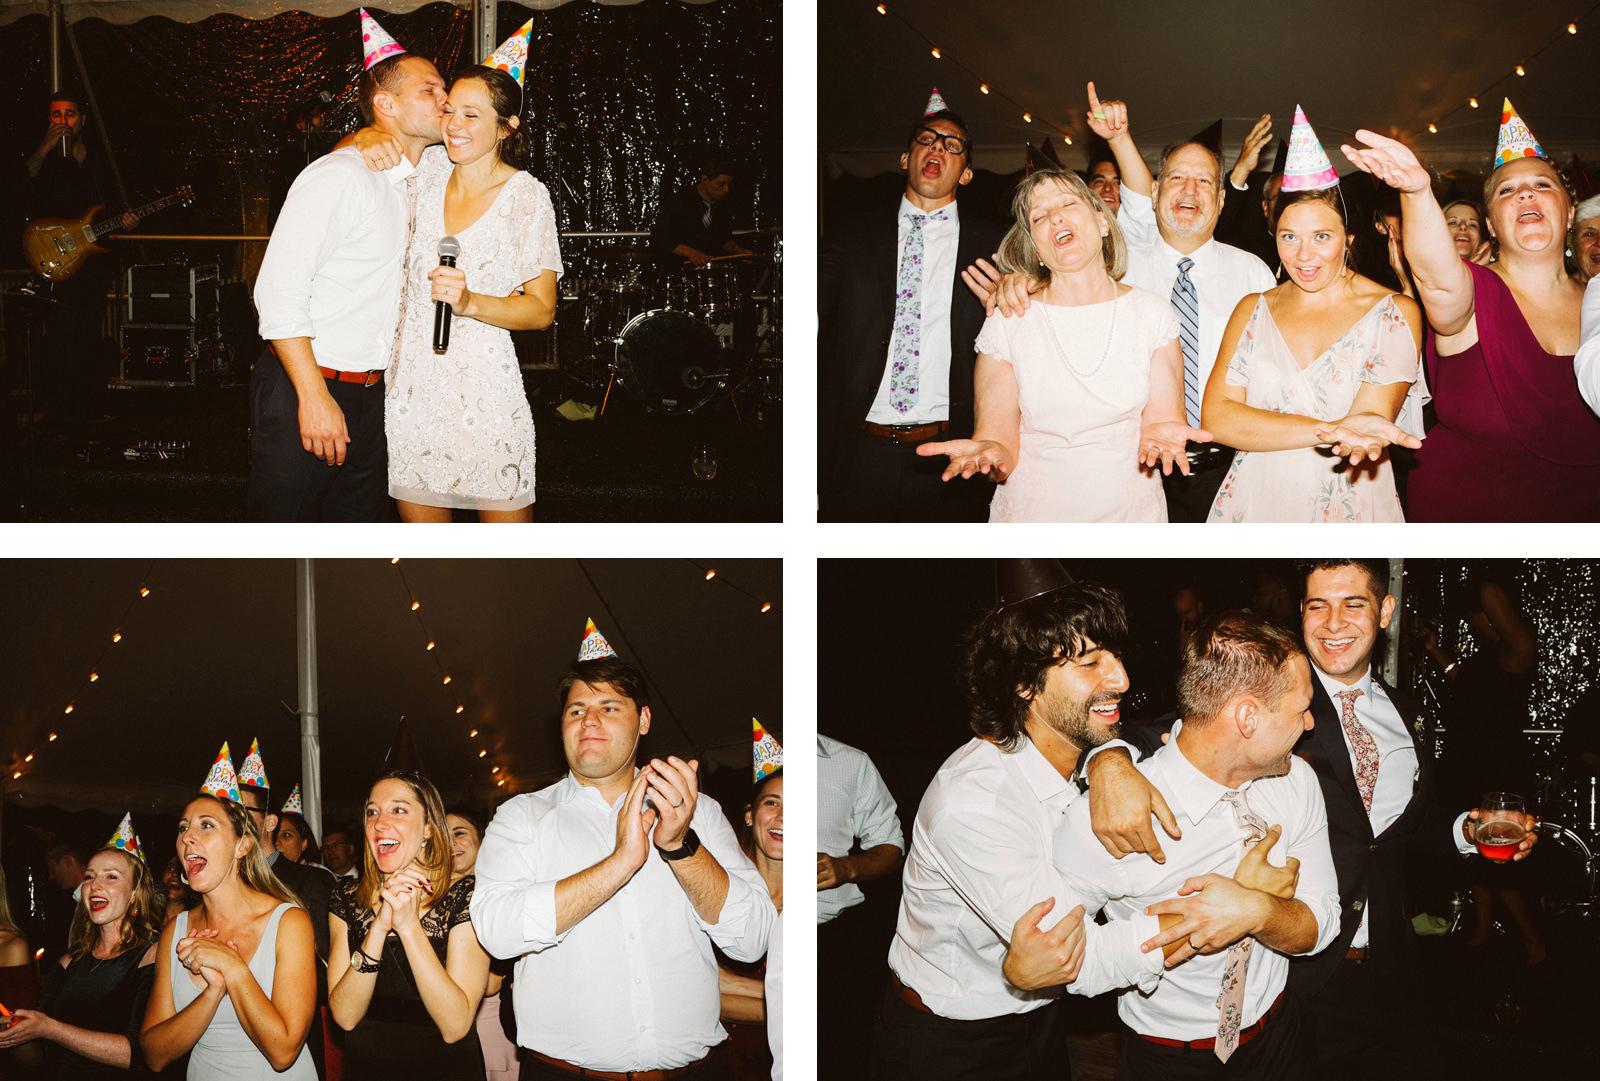 bridgeport-wedding-164 BRIDGEPORT, CONNECTICUT BACKYARD WEDDING